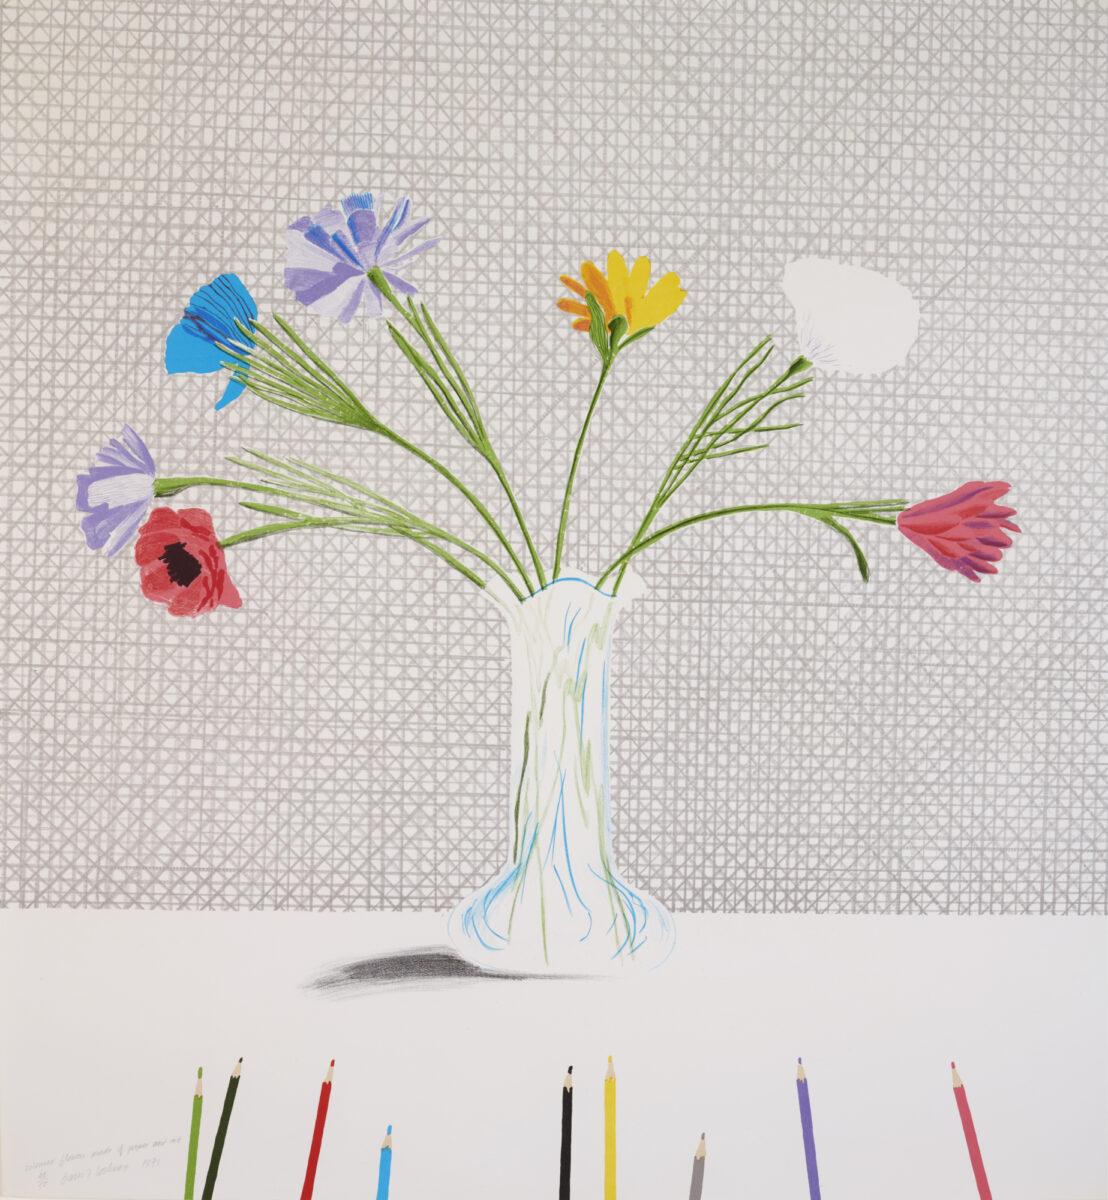 A20 58 HOCKNEY Coloured Flower crop